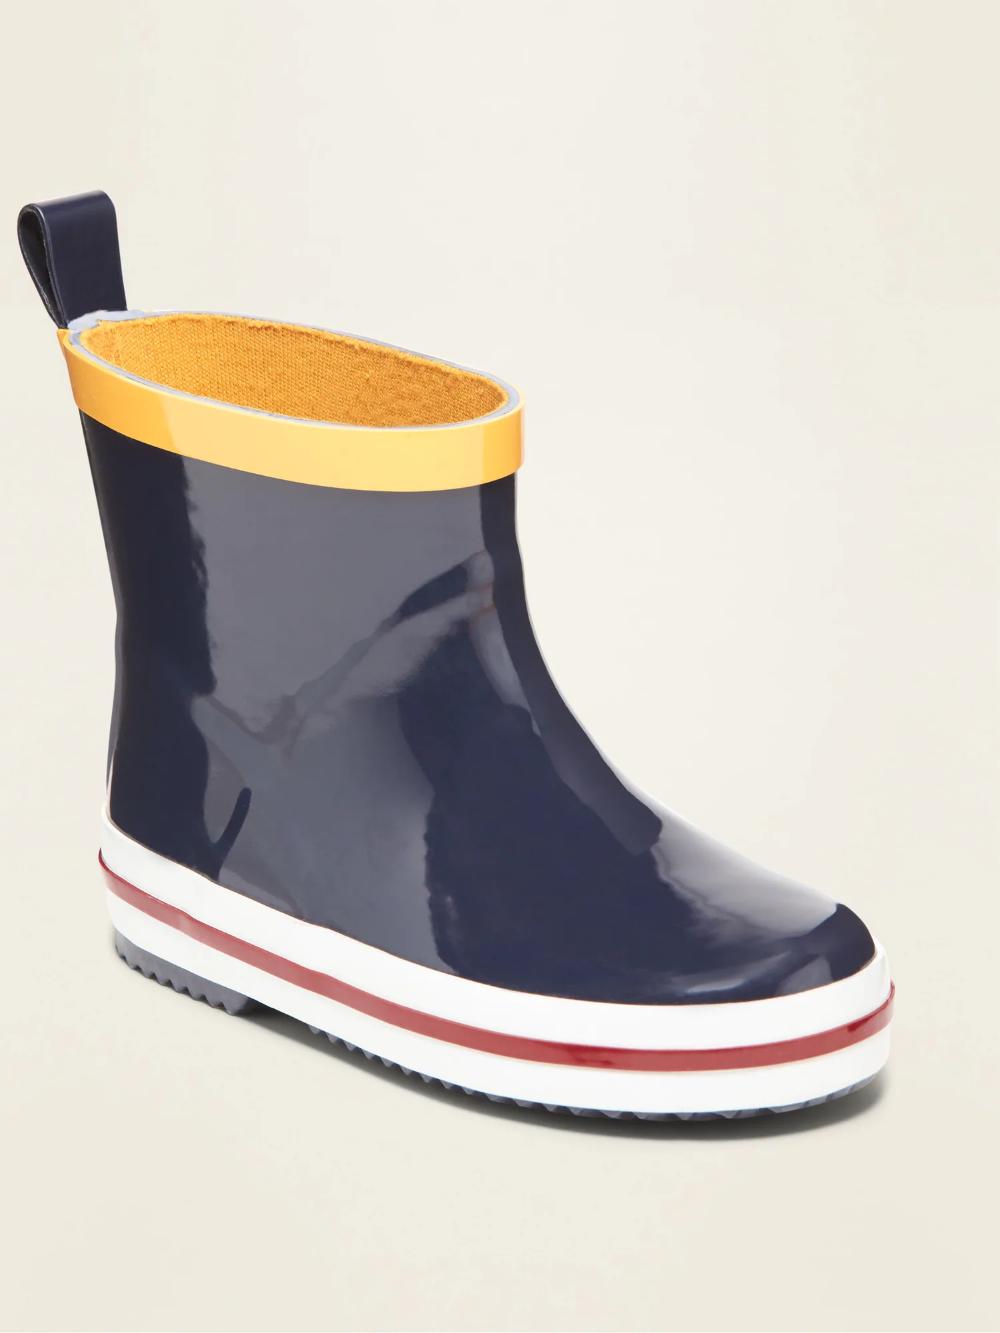 Short Rubber Rain Boots for Toddler